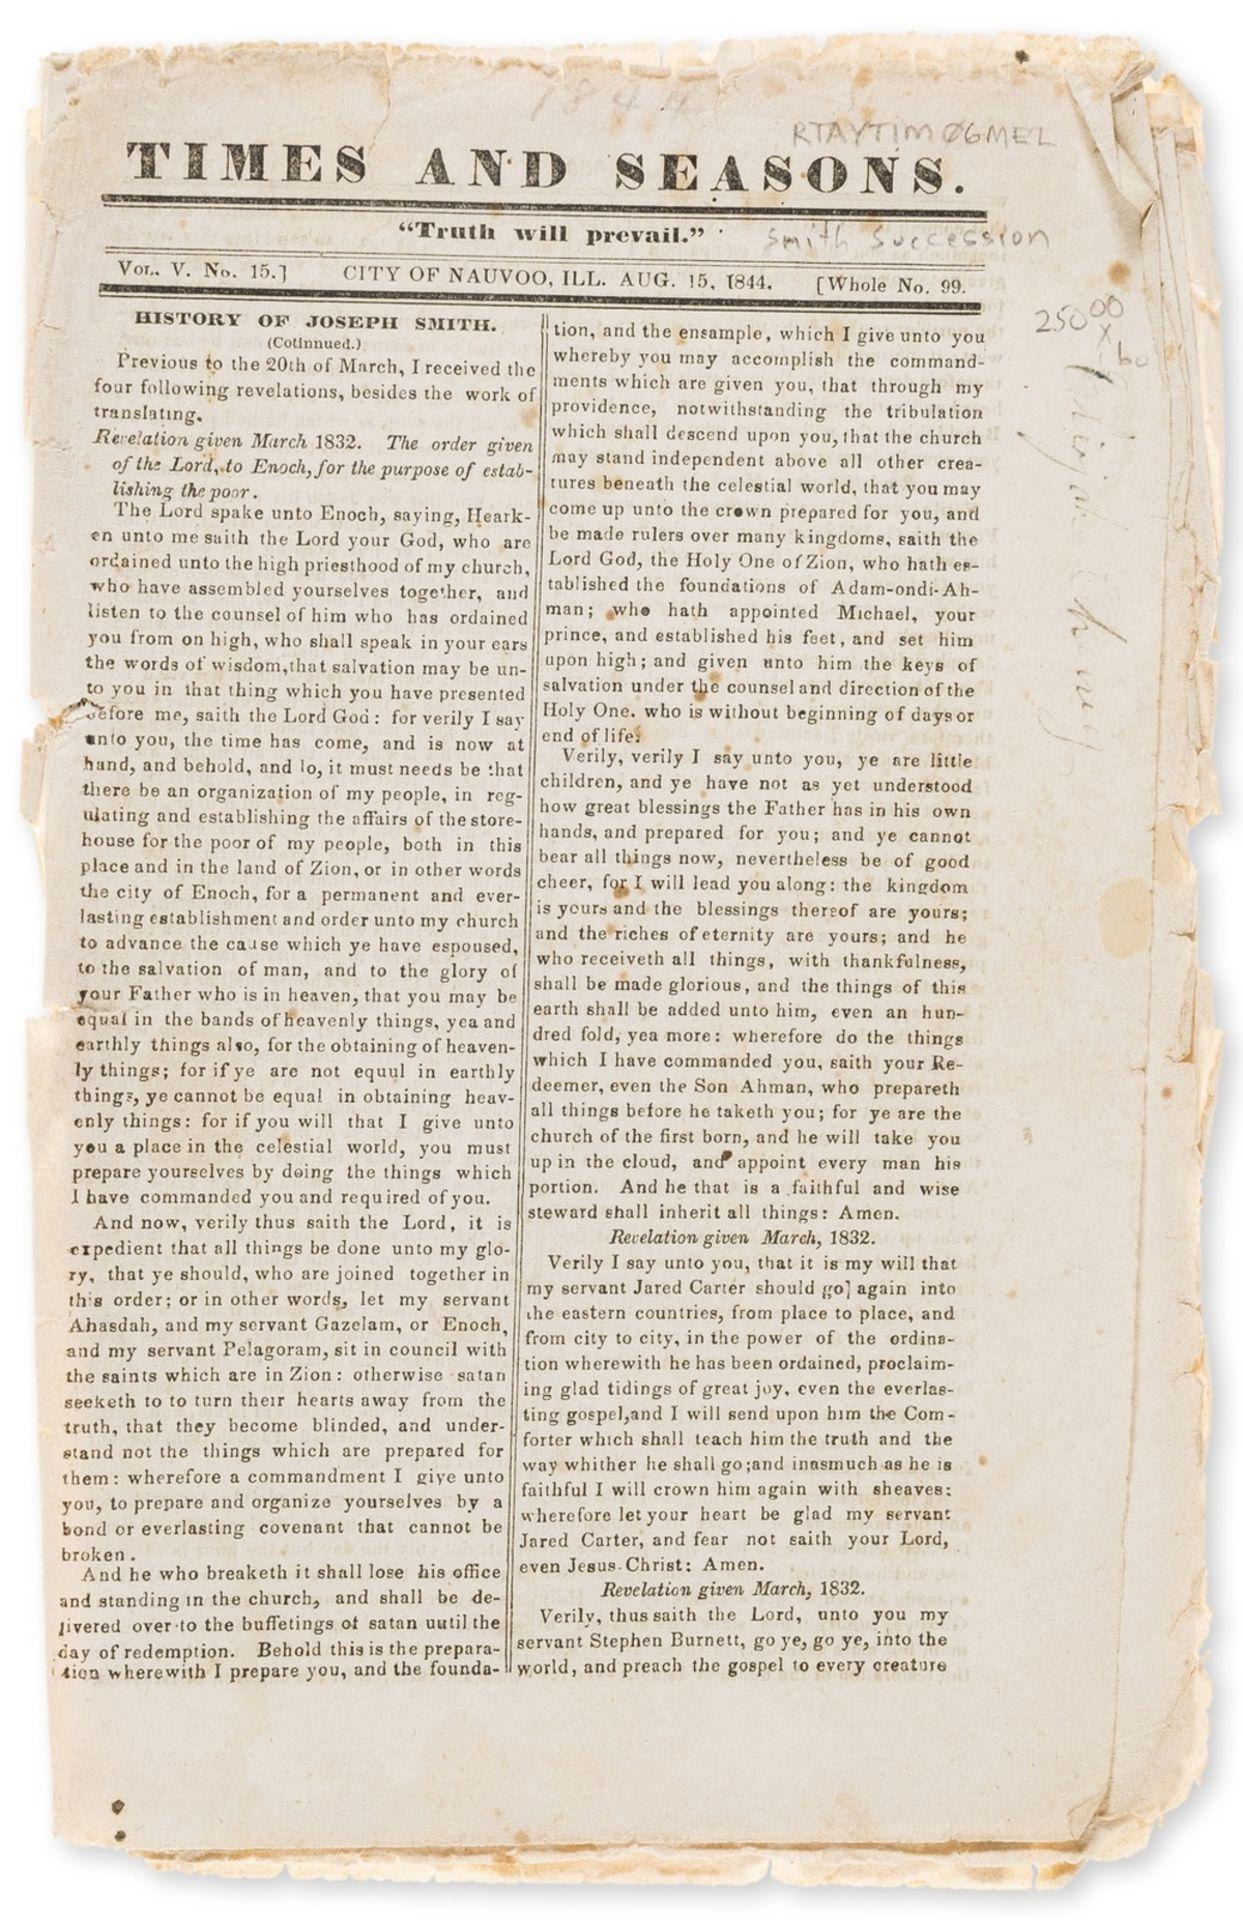 America.- Mormonism.- Smith (Joseph) [The King Follett Sermon], Nauvoo, IL, 1844.